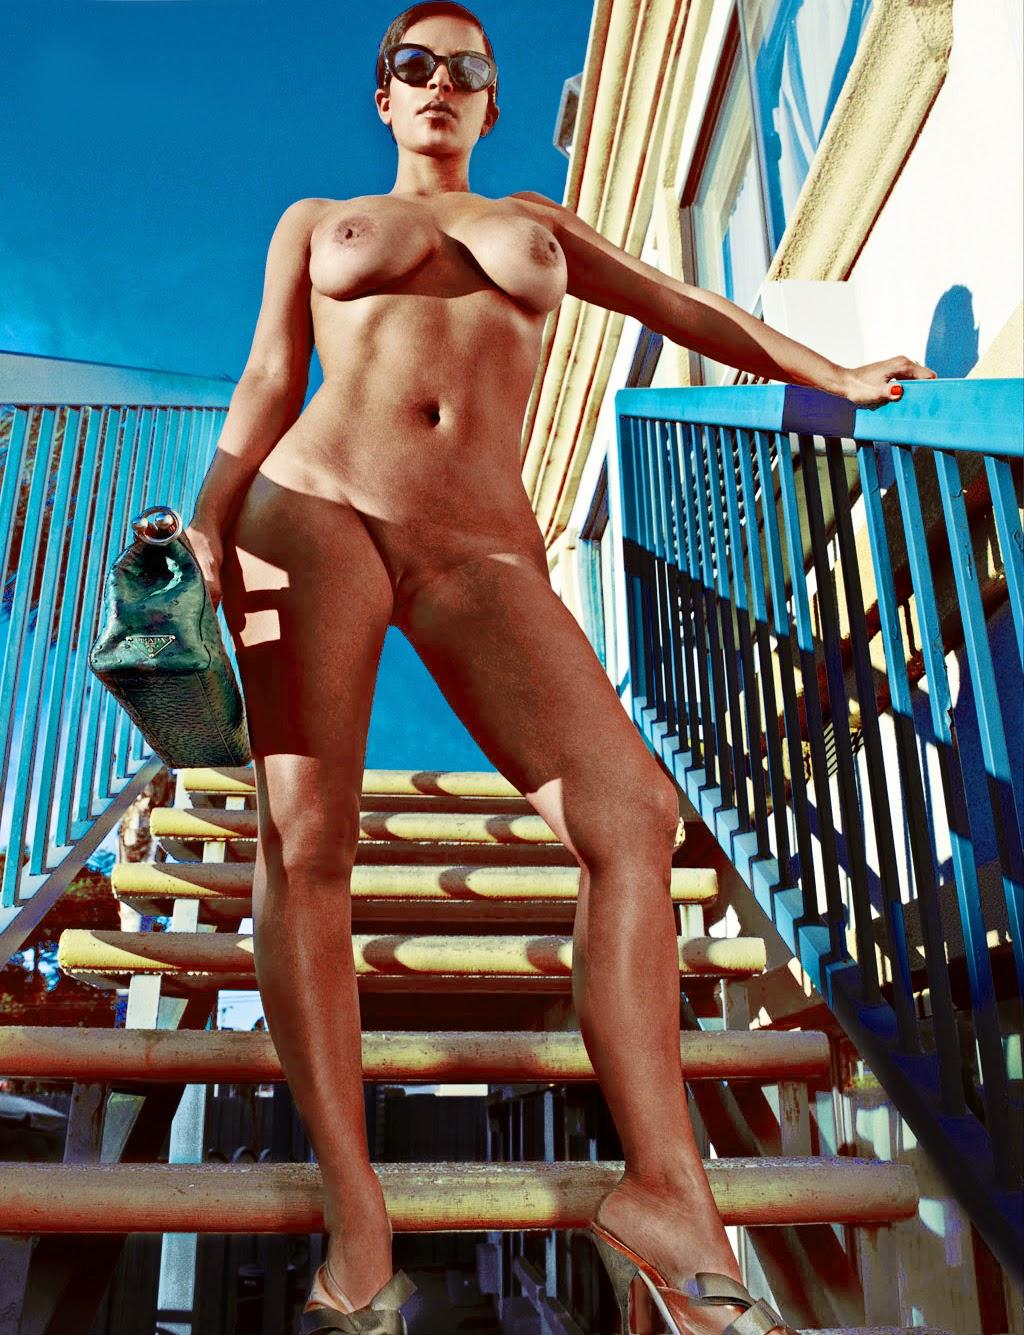 mallu sex racket nude